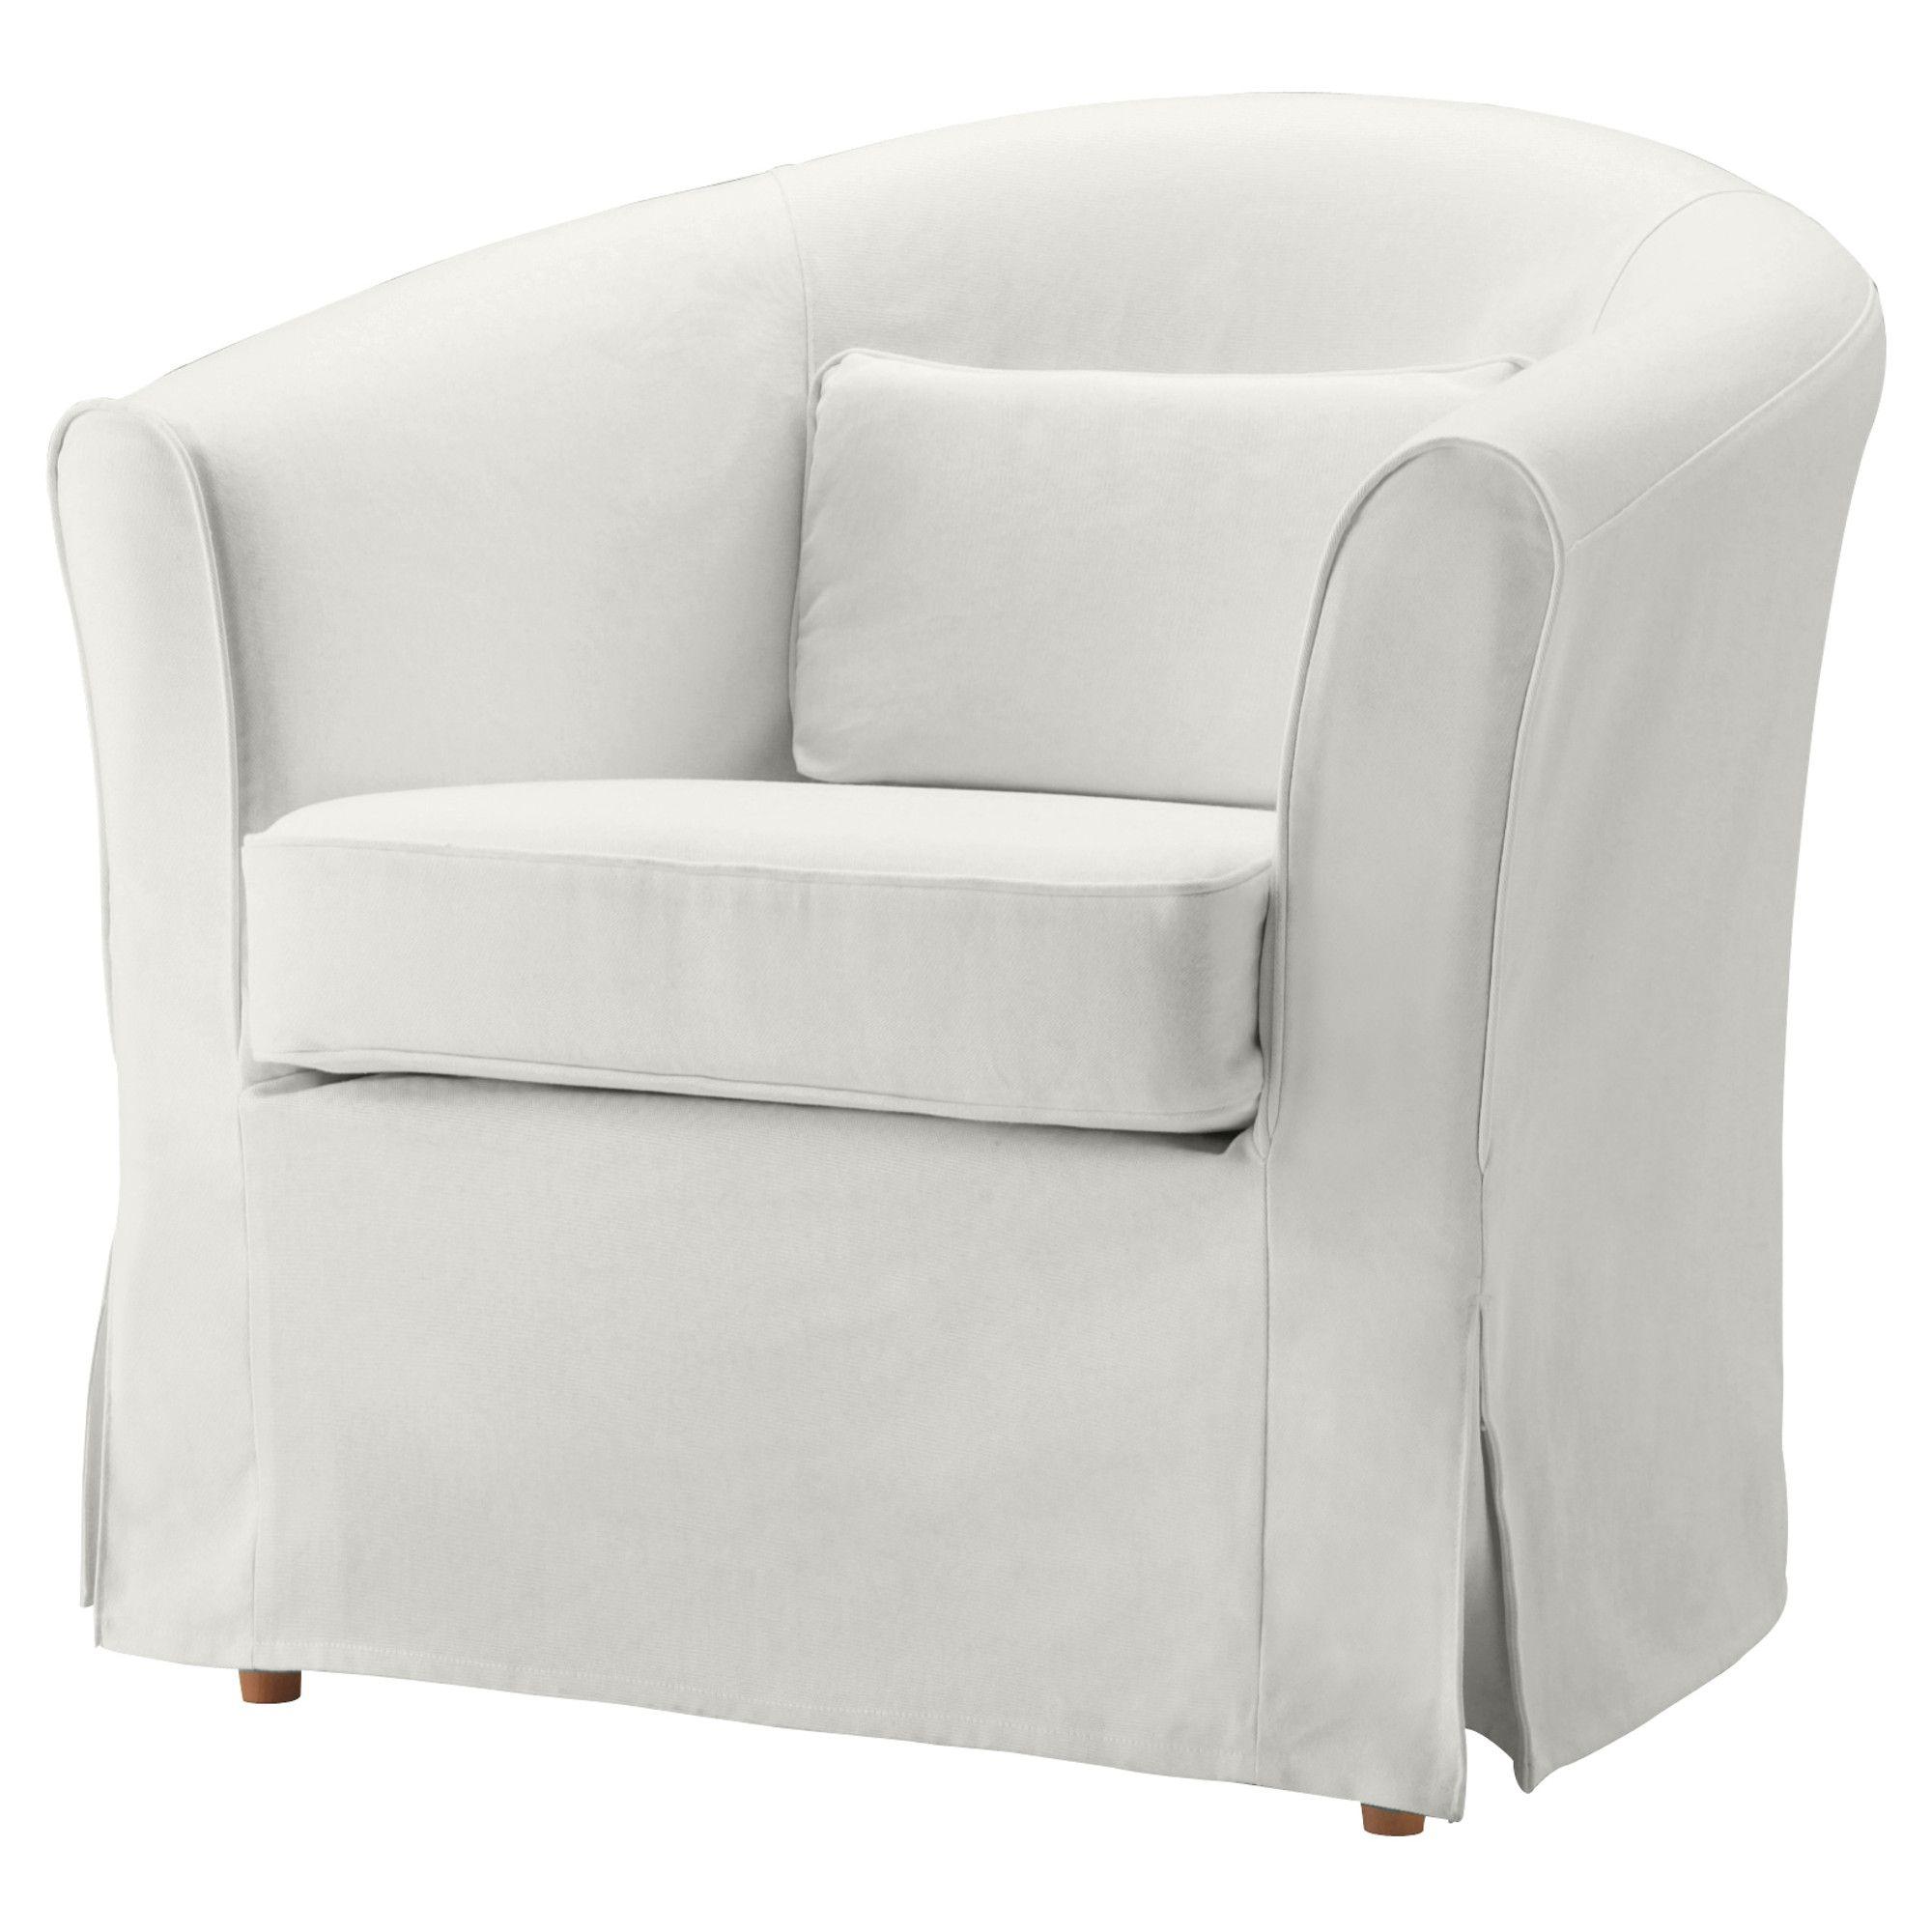 EKTORP TULLSTA Chair natural Blekinge white IKEA $129